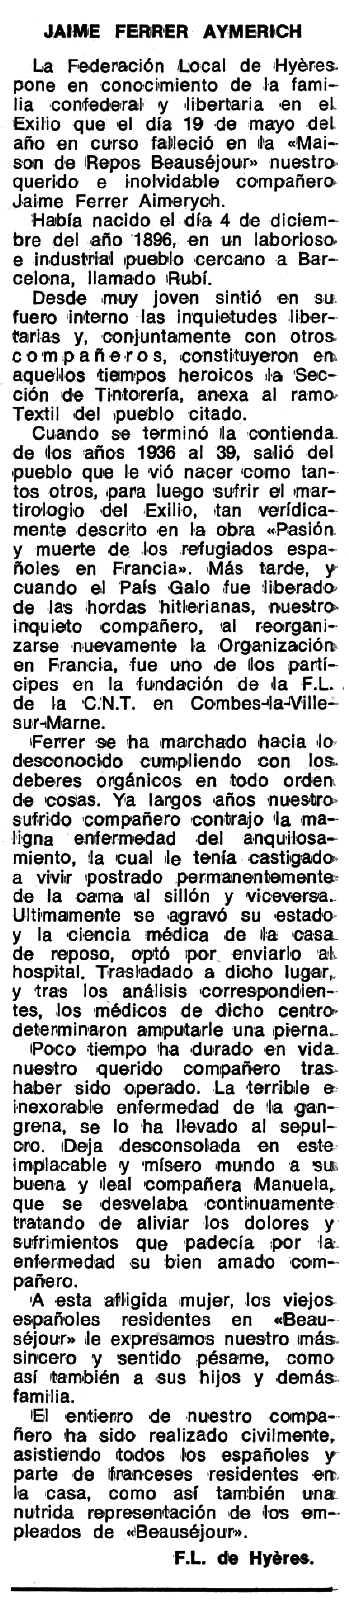 "Necrològica de Jaume Ferrer Aymerich publicada en el periòdic tolosà ""Espoir"" del 10 de juliol de 1978"